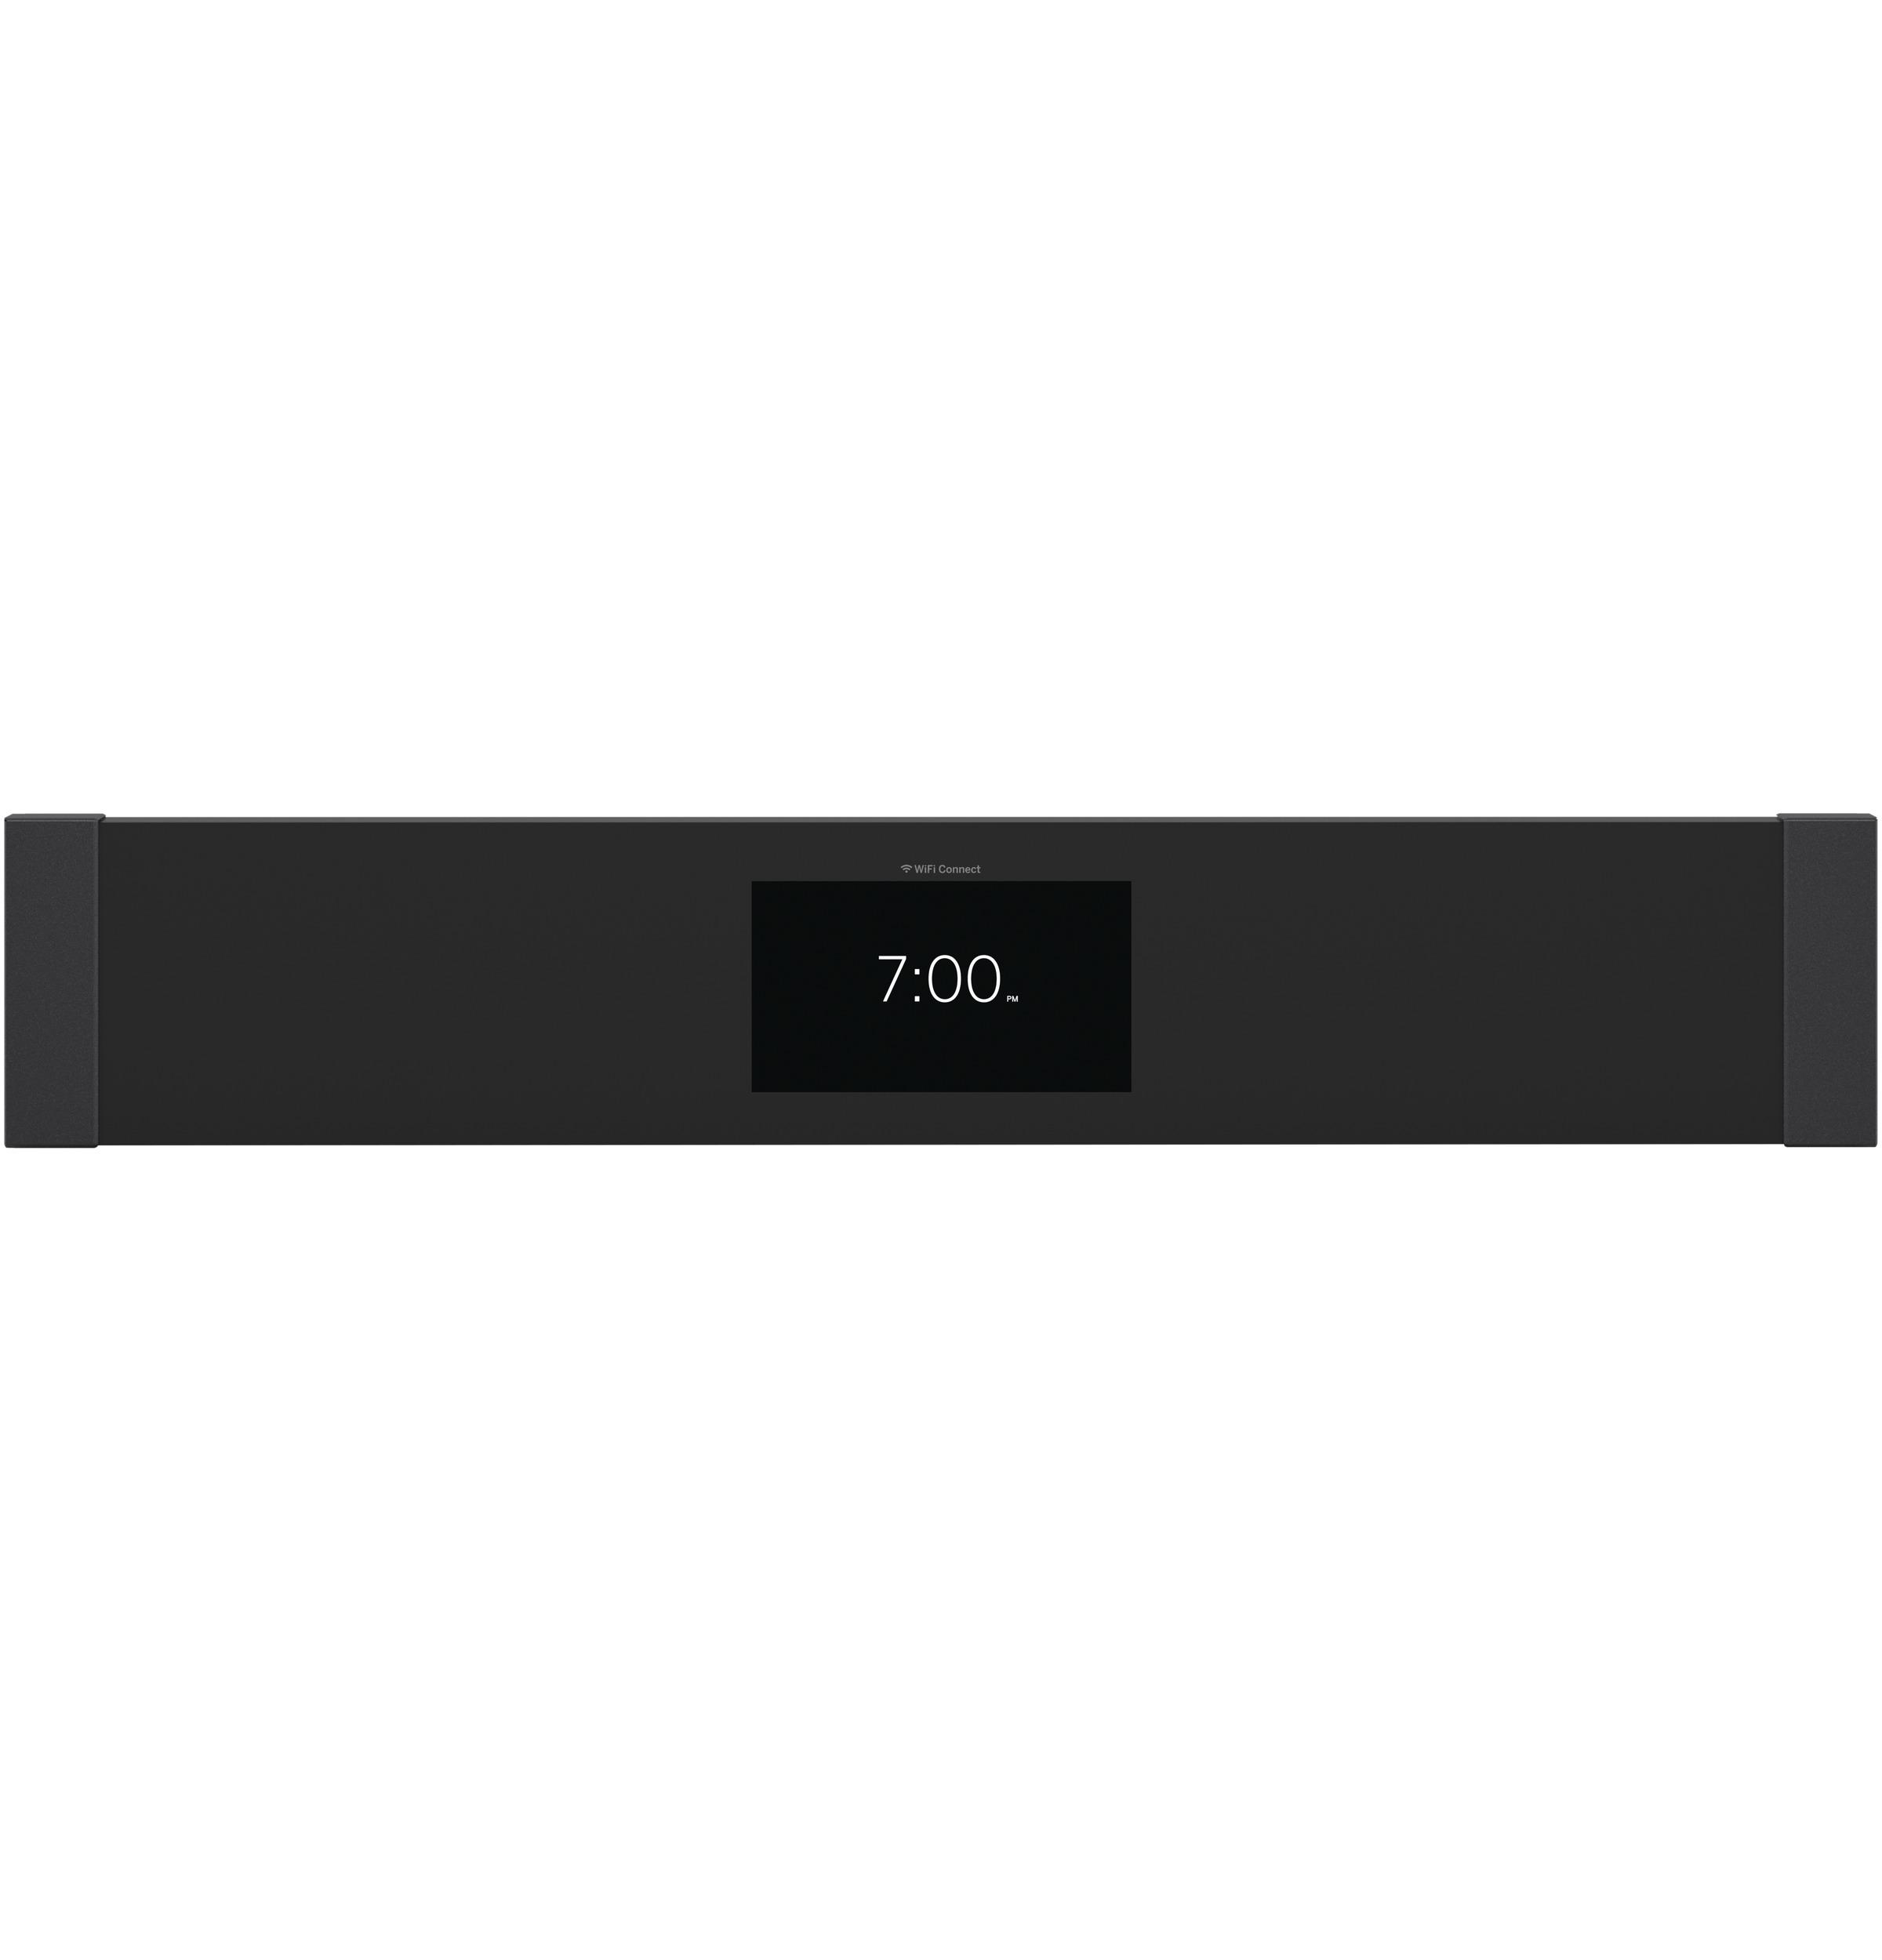 Model: PTS7000FNDS | GE Profile™ Series 30